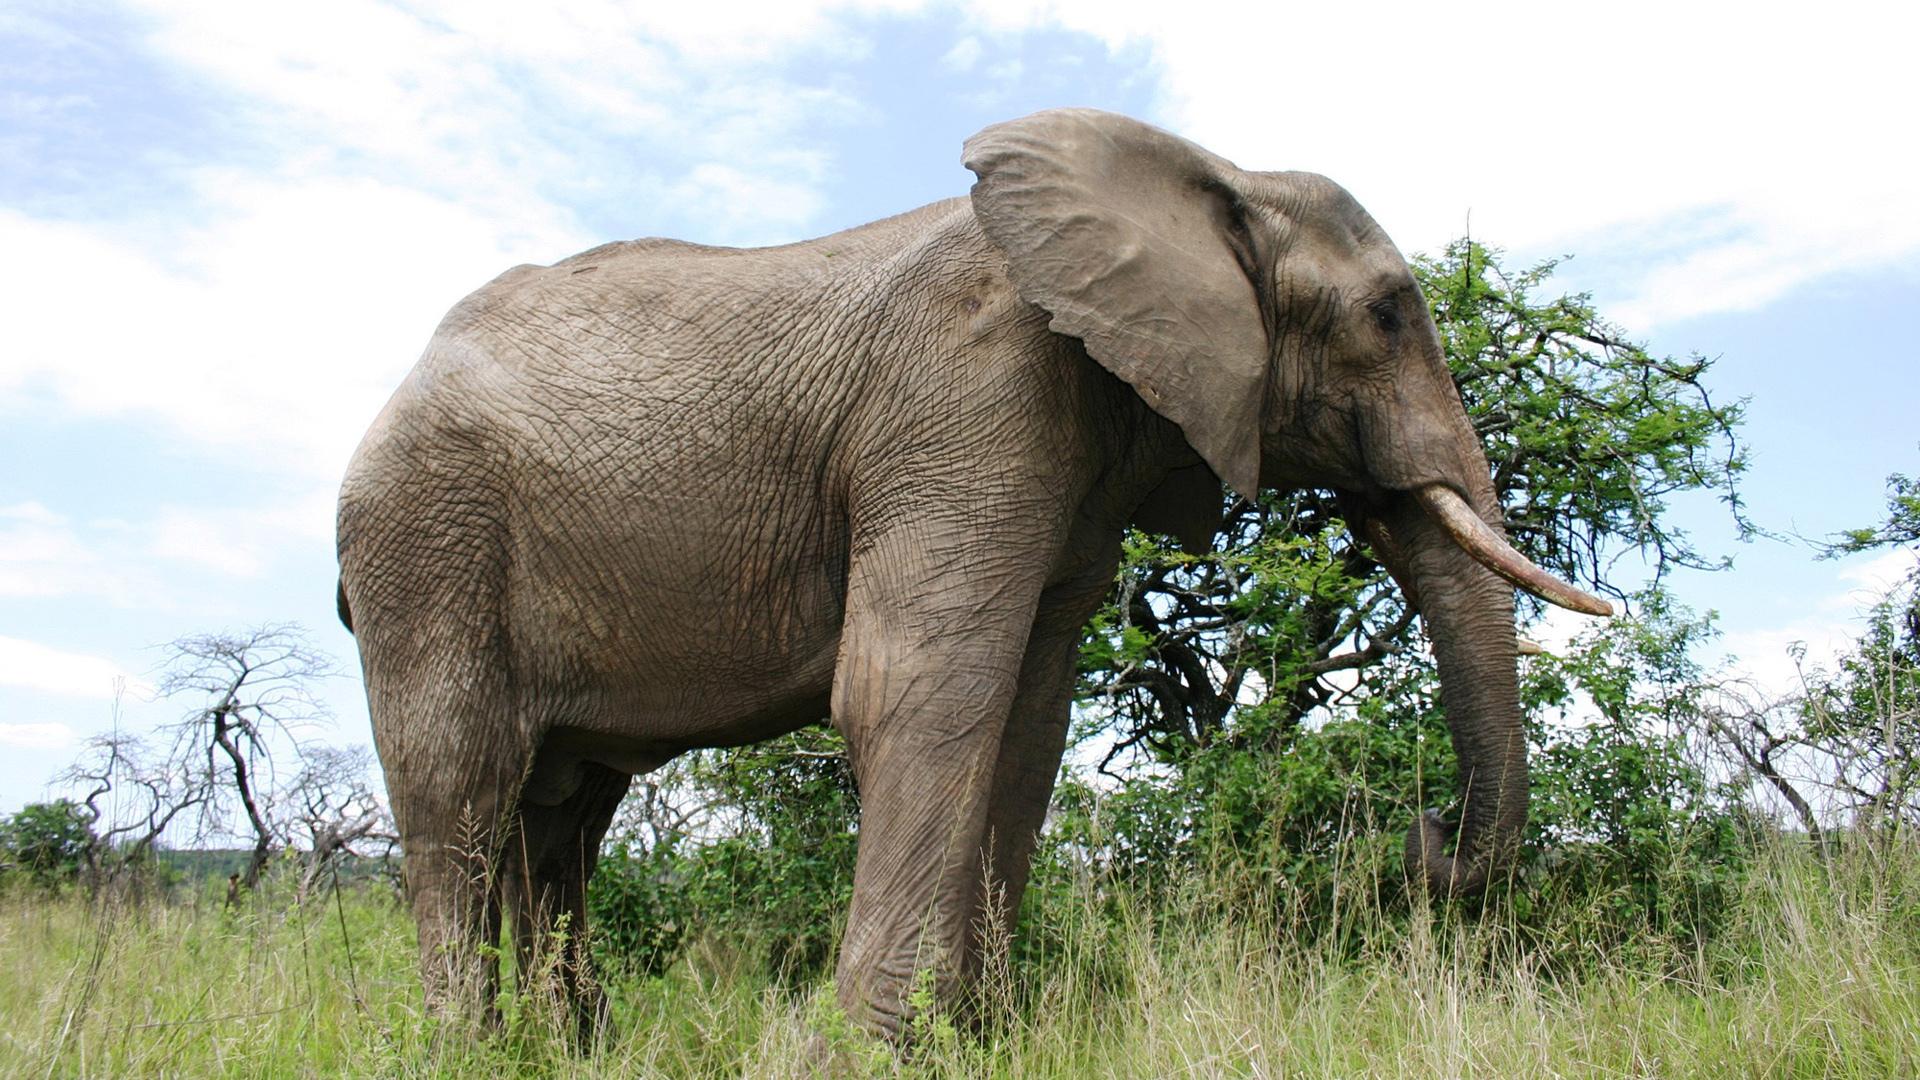 Elephant Wallpapers Im...